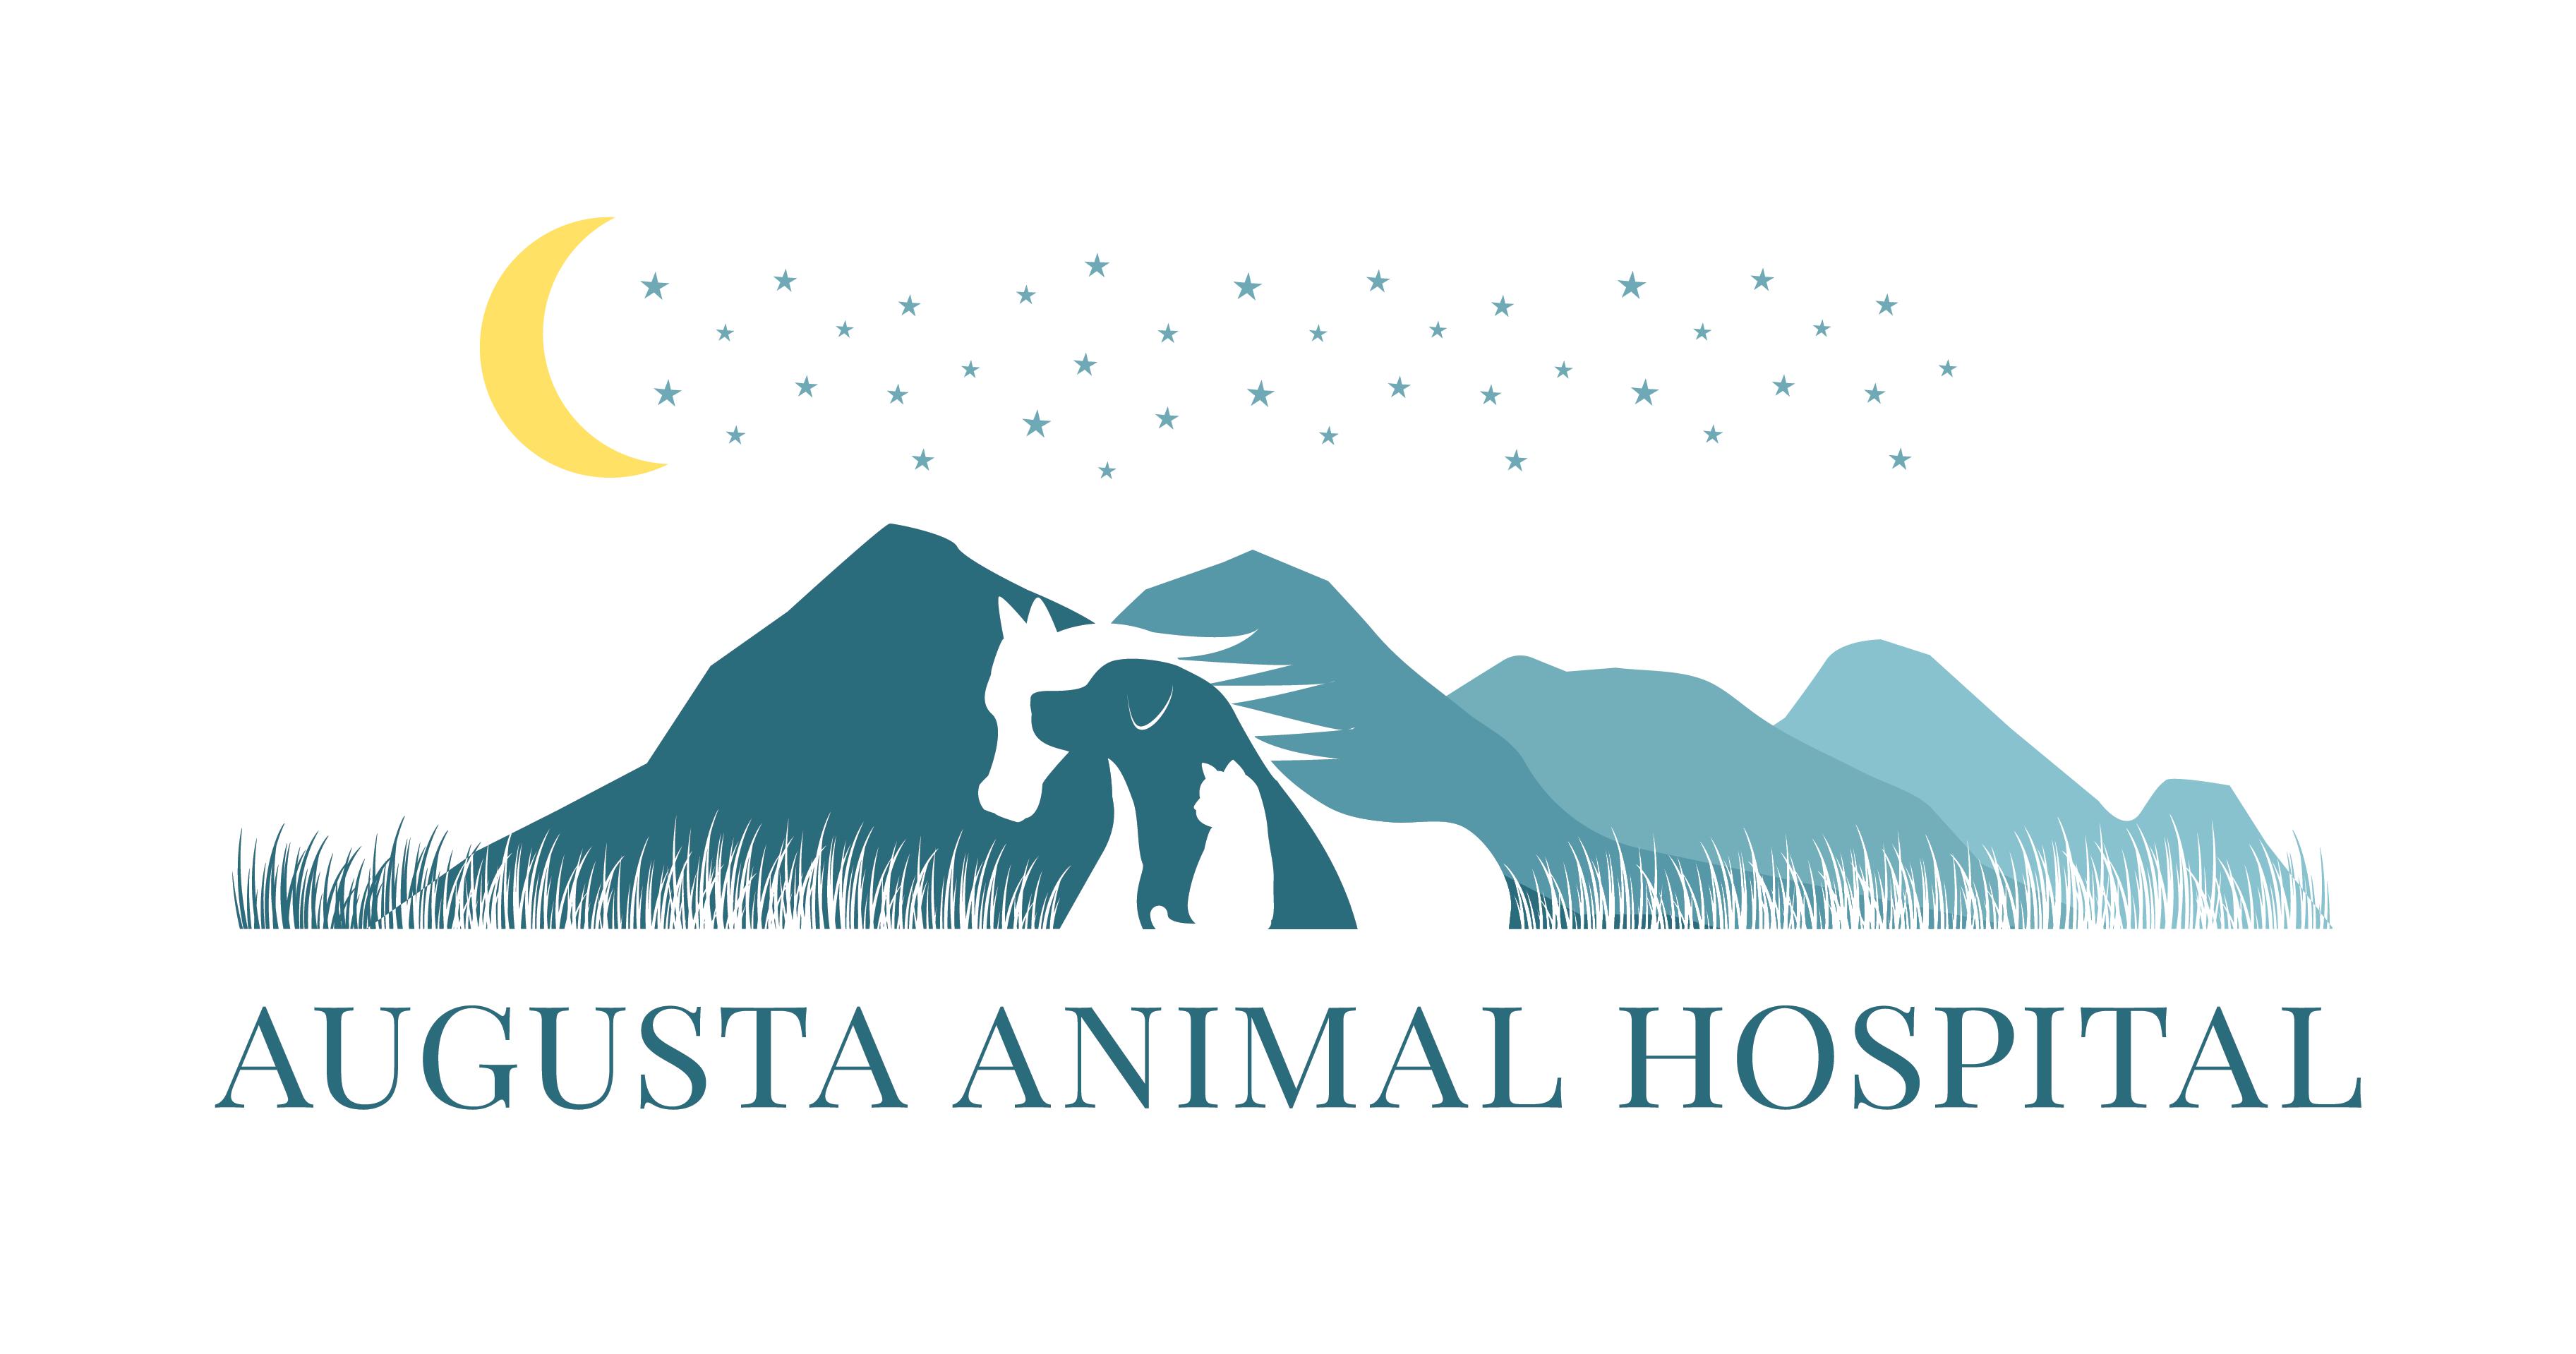 Rural Animal Hospital Needs Unique and Fresh Logo